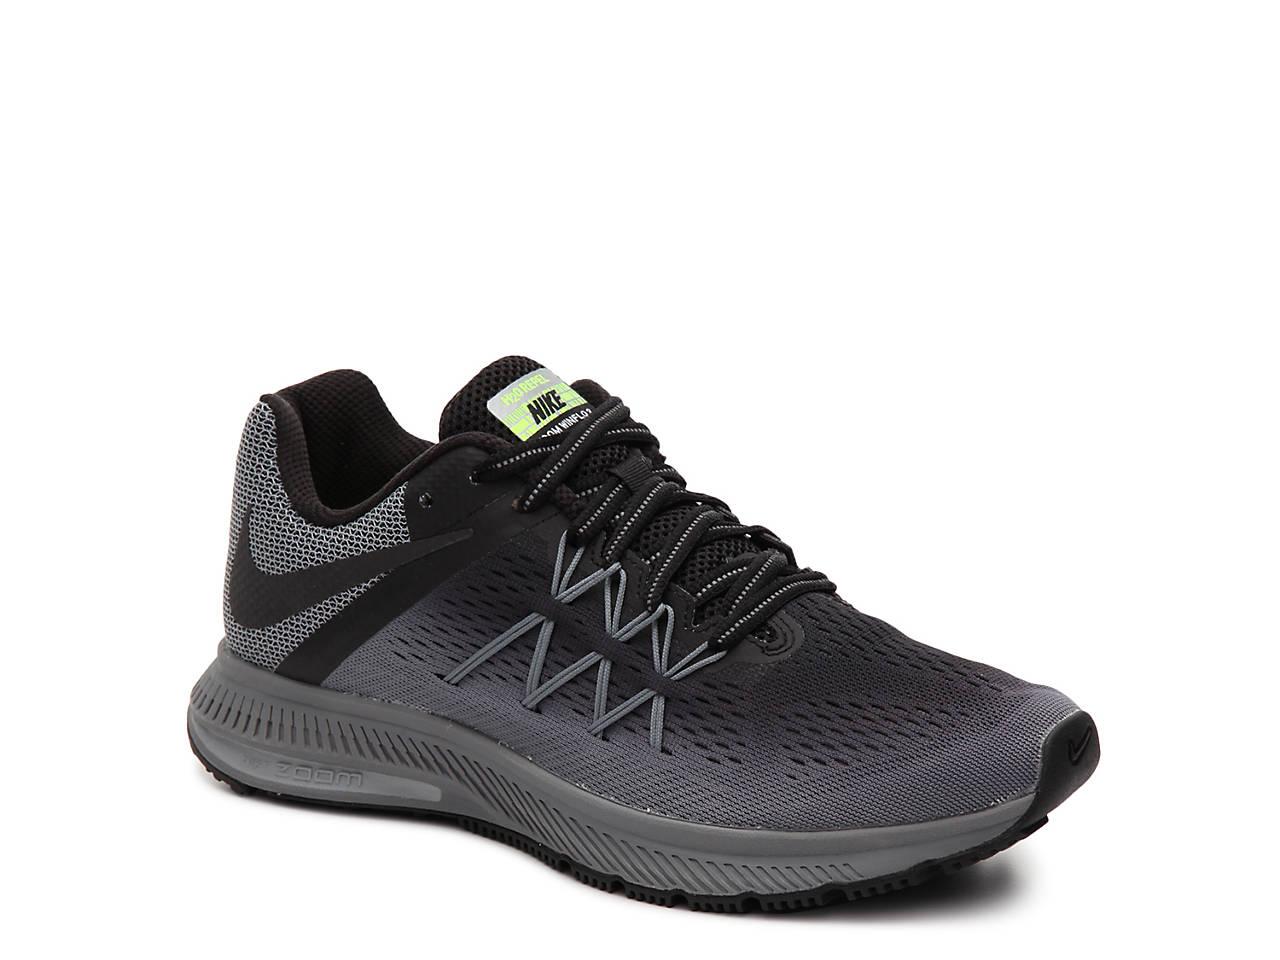 Zoom Winflo 3 Shield Lightweight Running Shoe - Women's